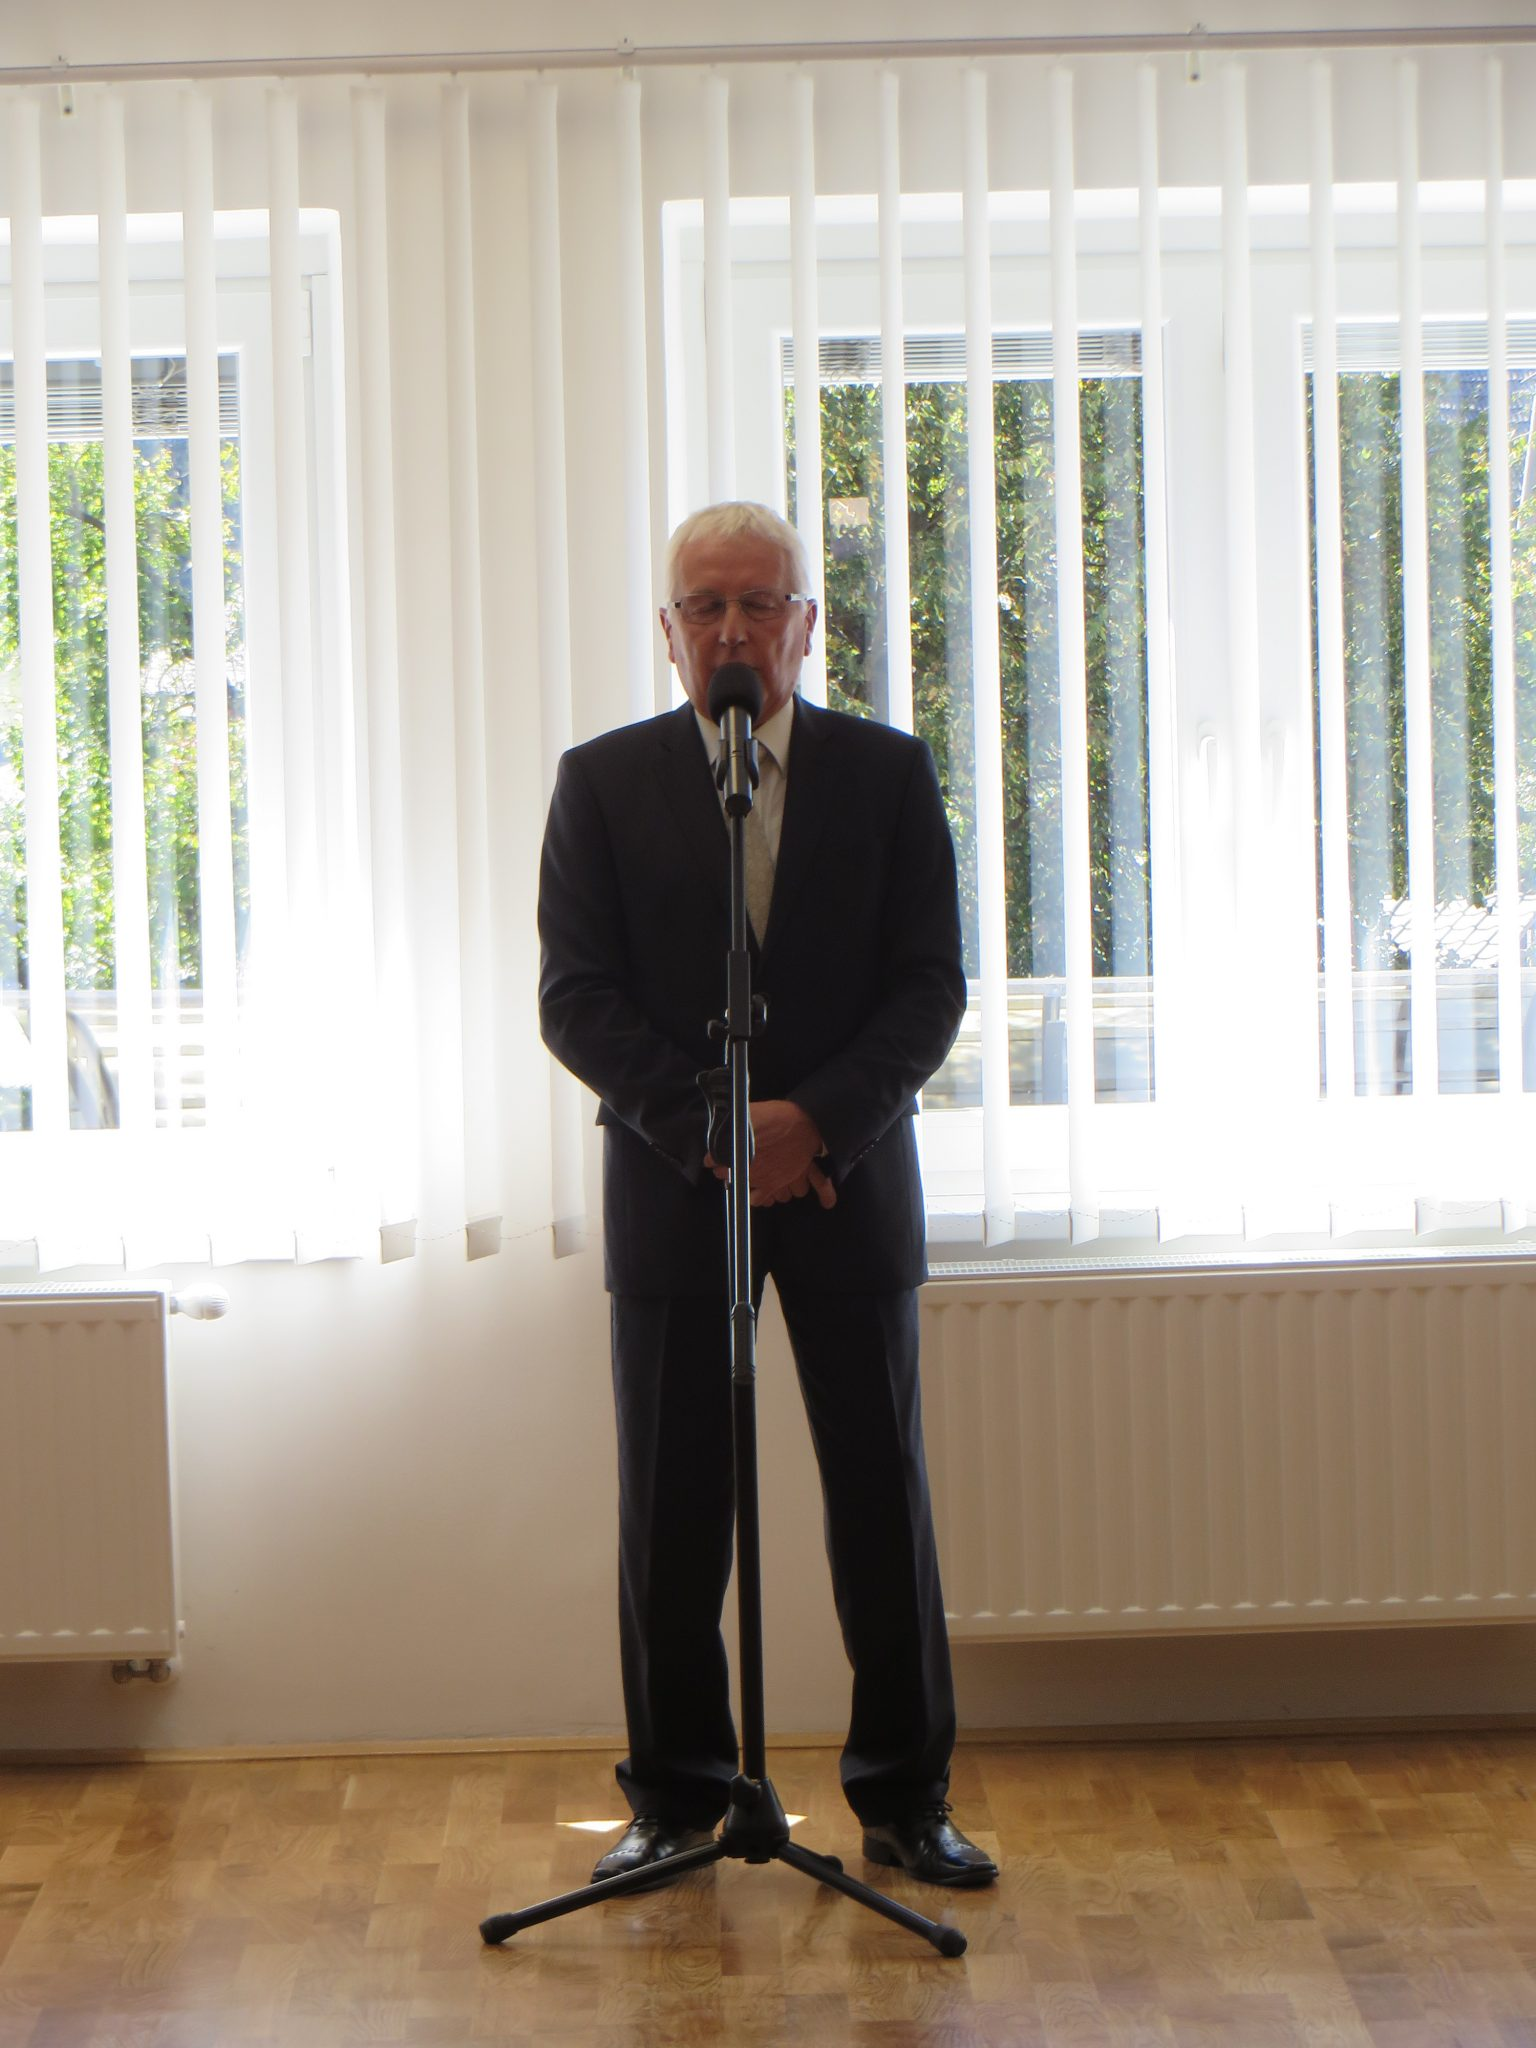 IMG 5323 - Odprtje novih prostorov KJUC – Enota Ivana Čampa Nova vas